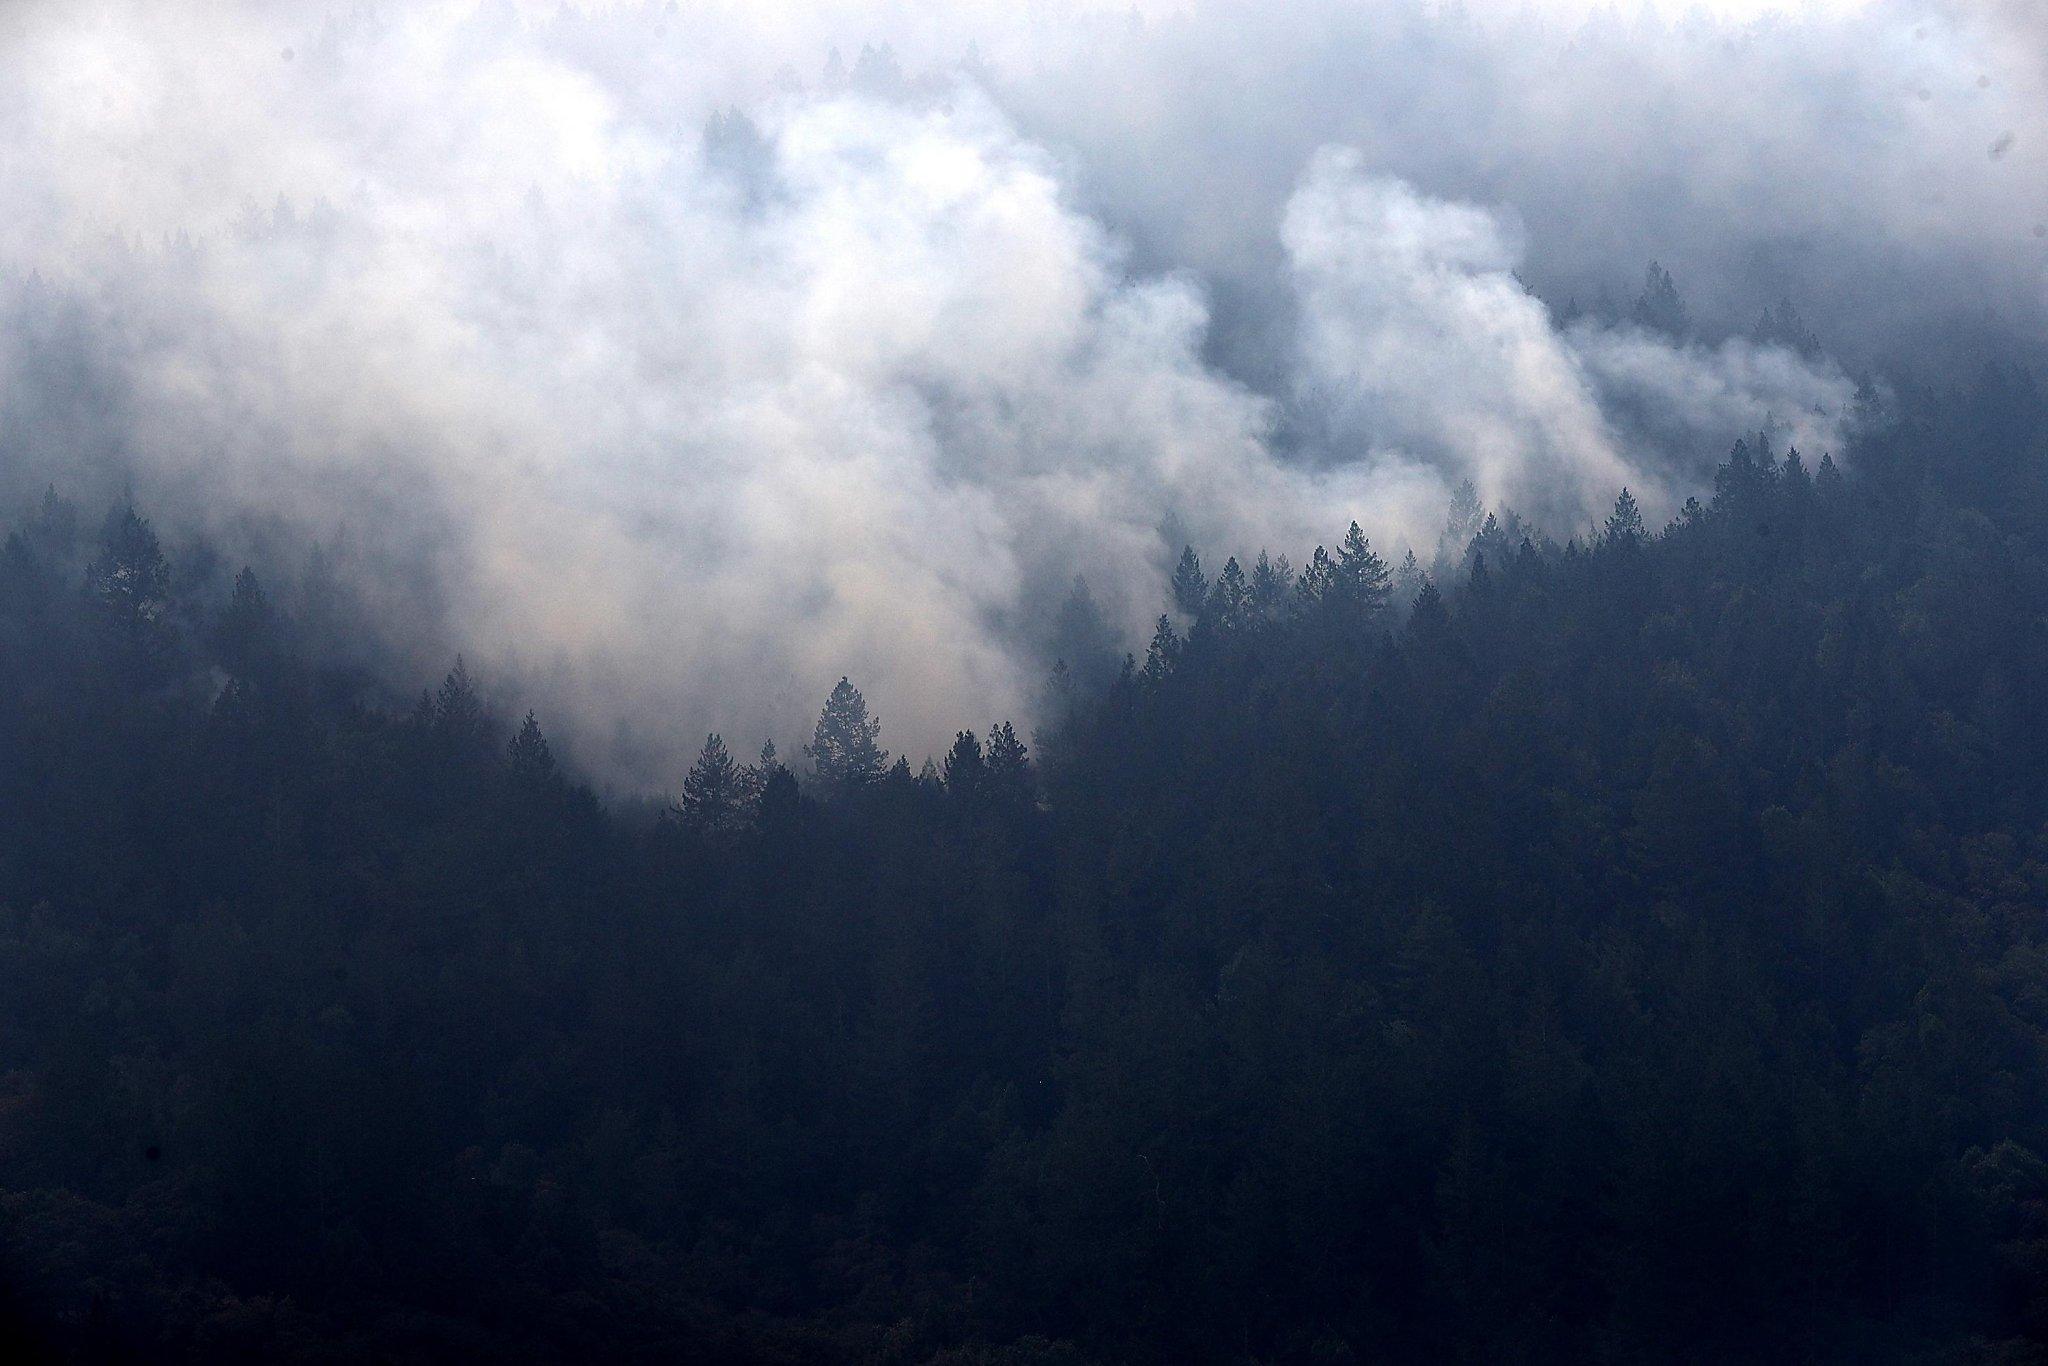 Wine Country fire smoke sickening people nearly 100 miles away